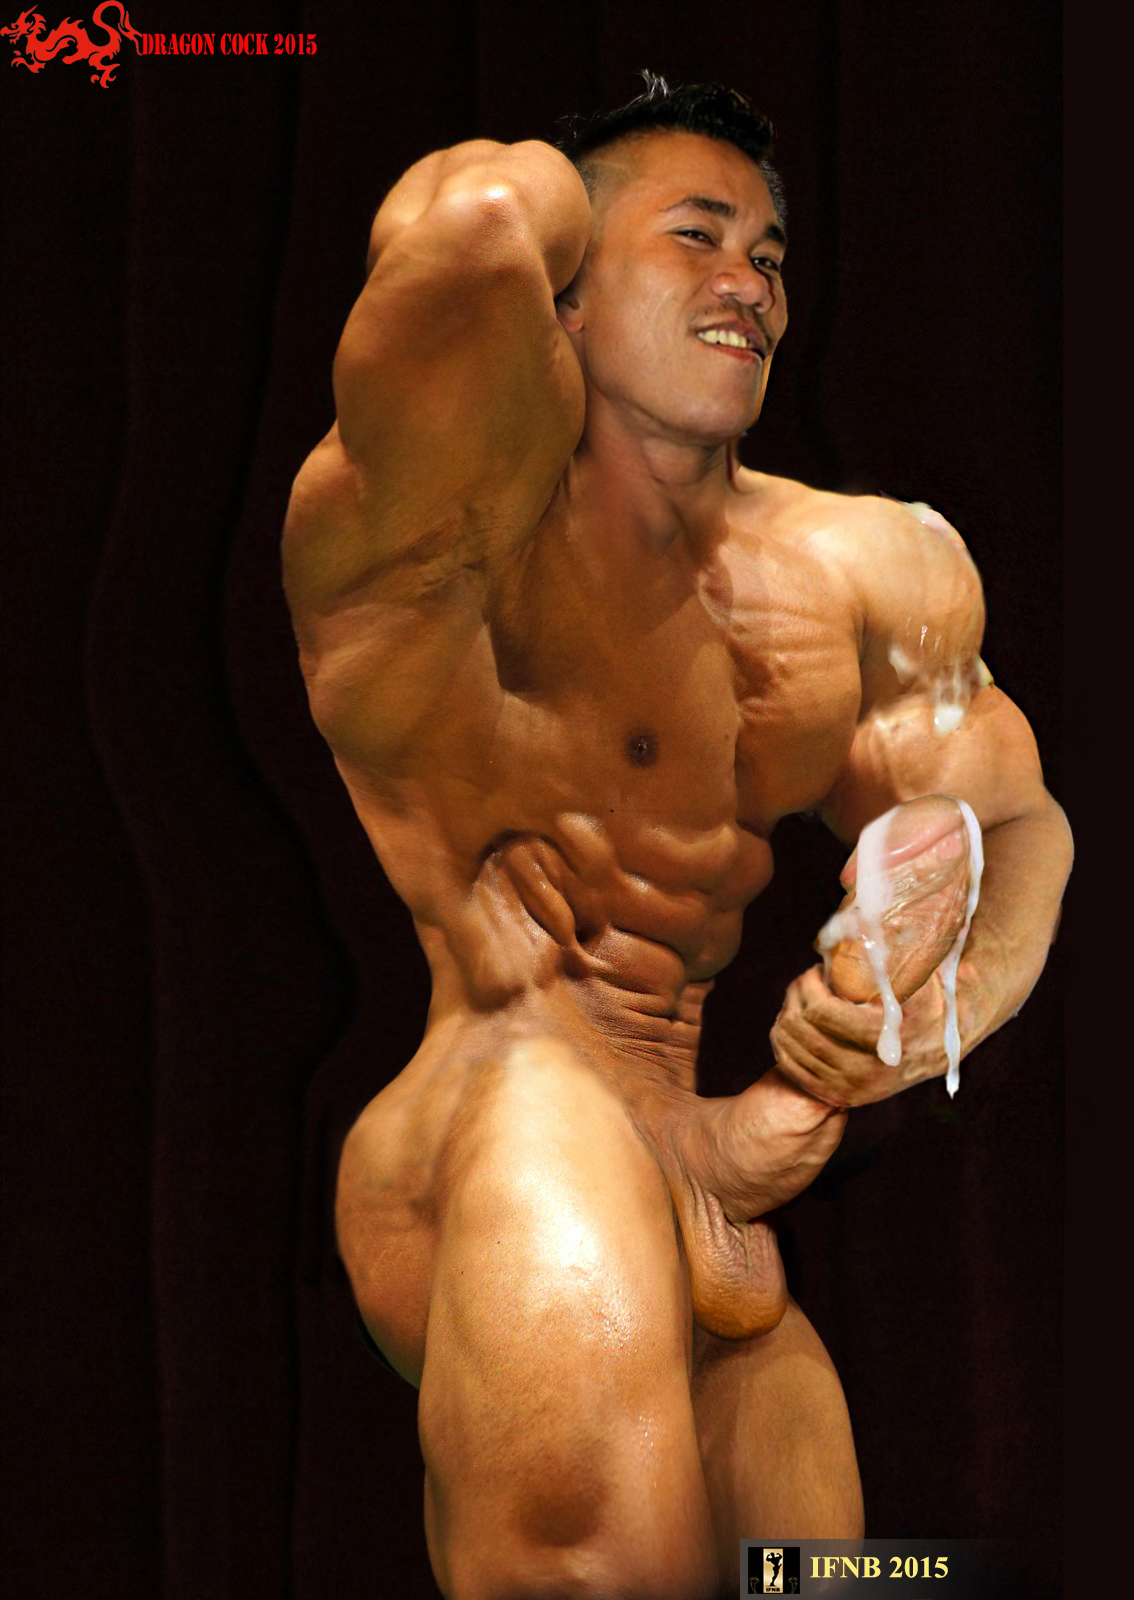 Nude bodybuilders with big dicks - Porn pictures